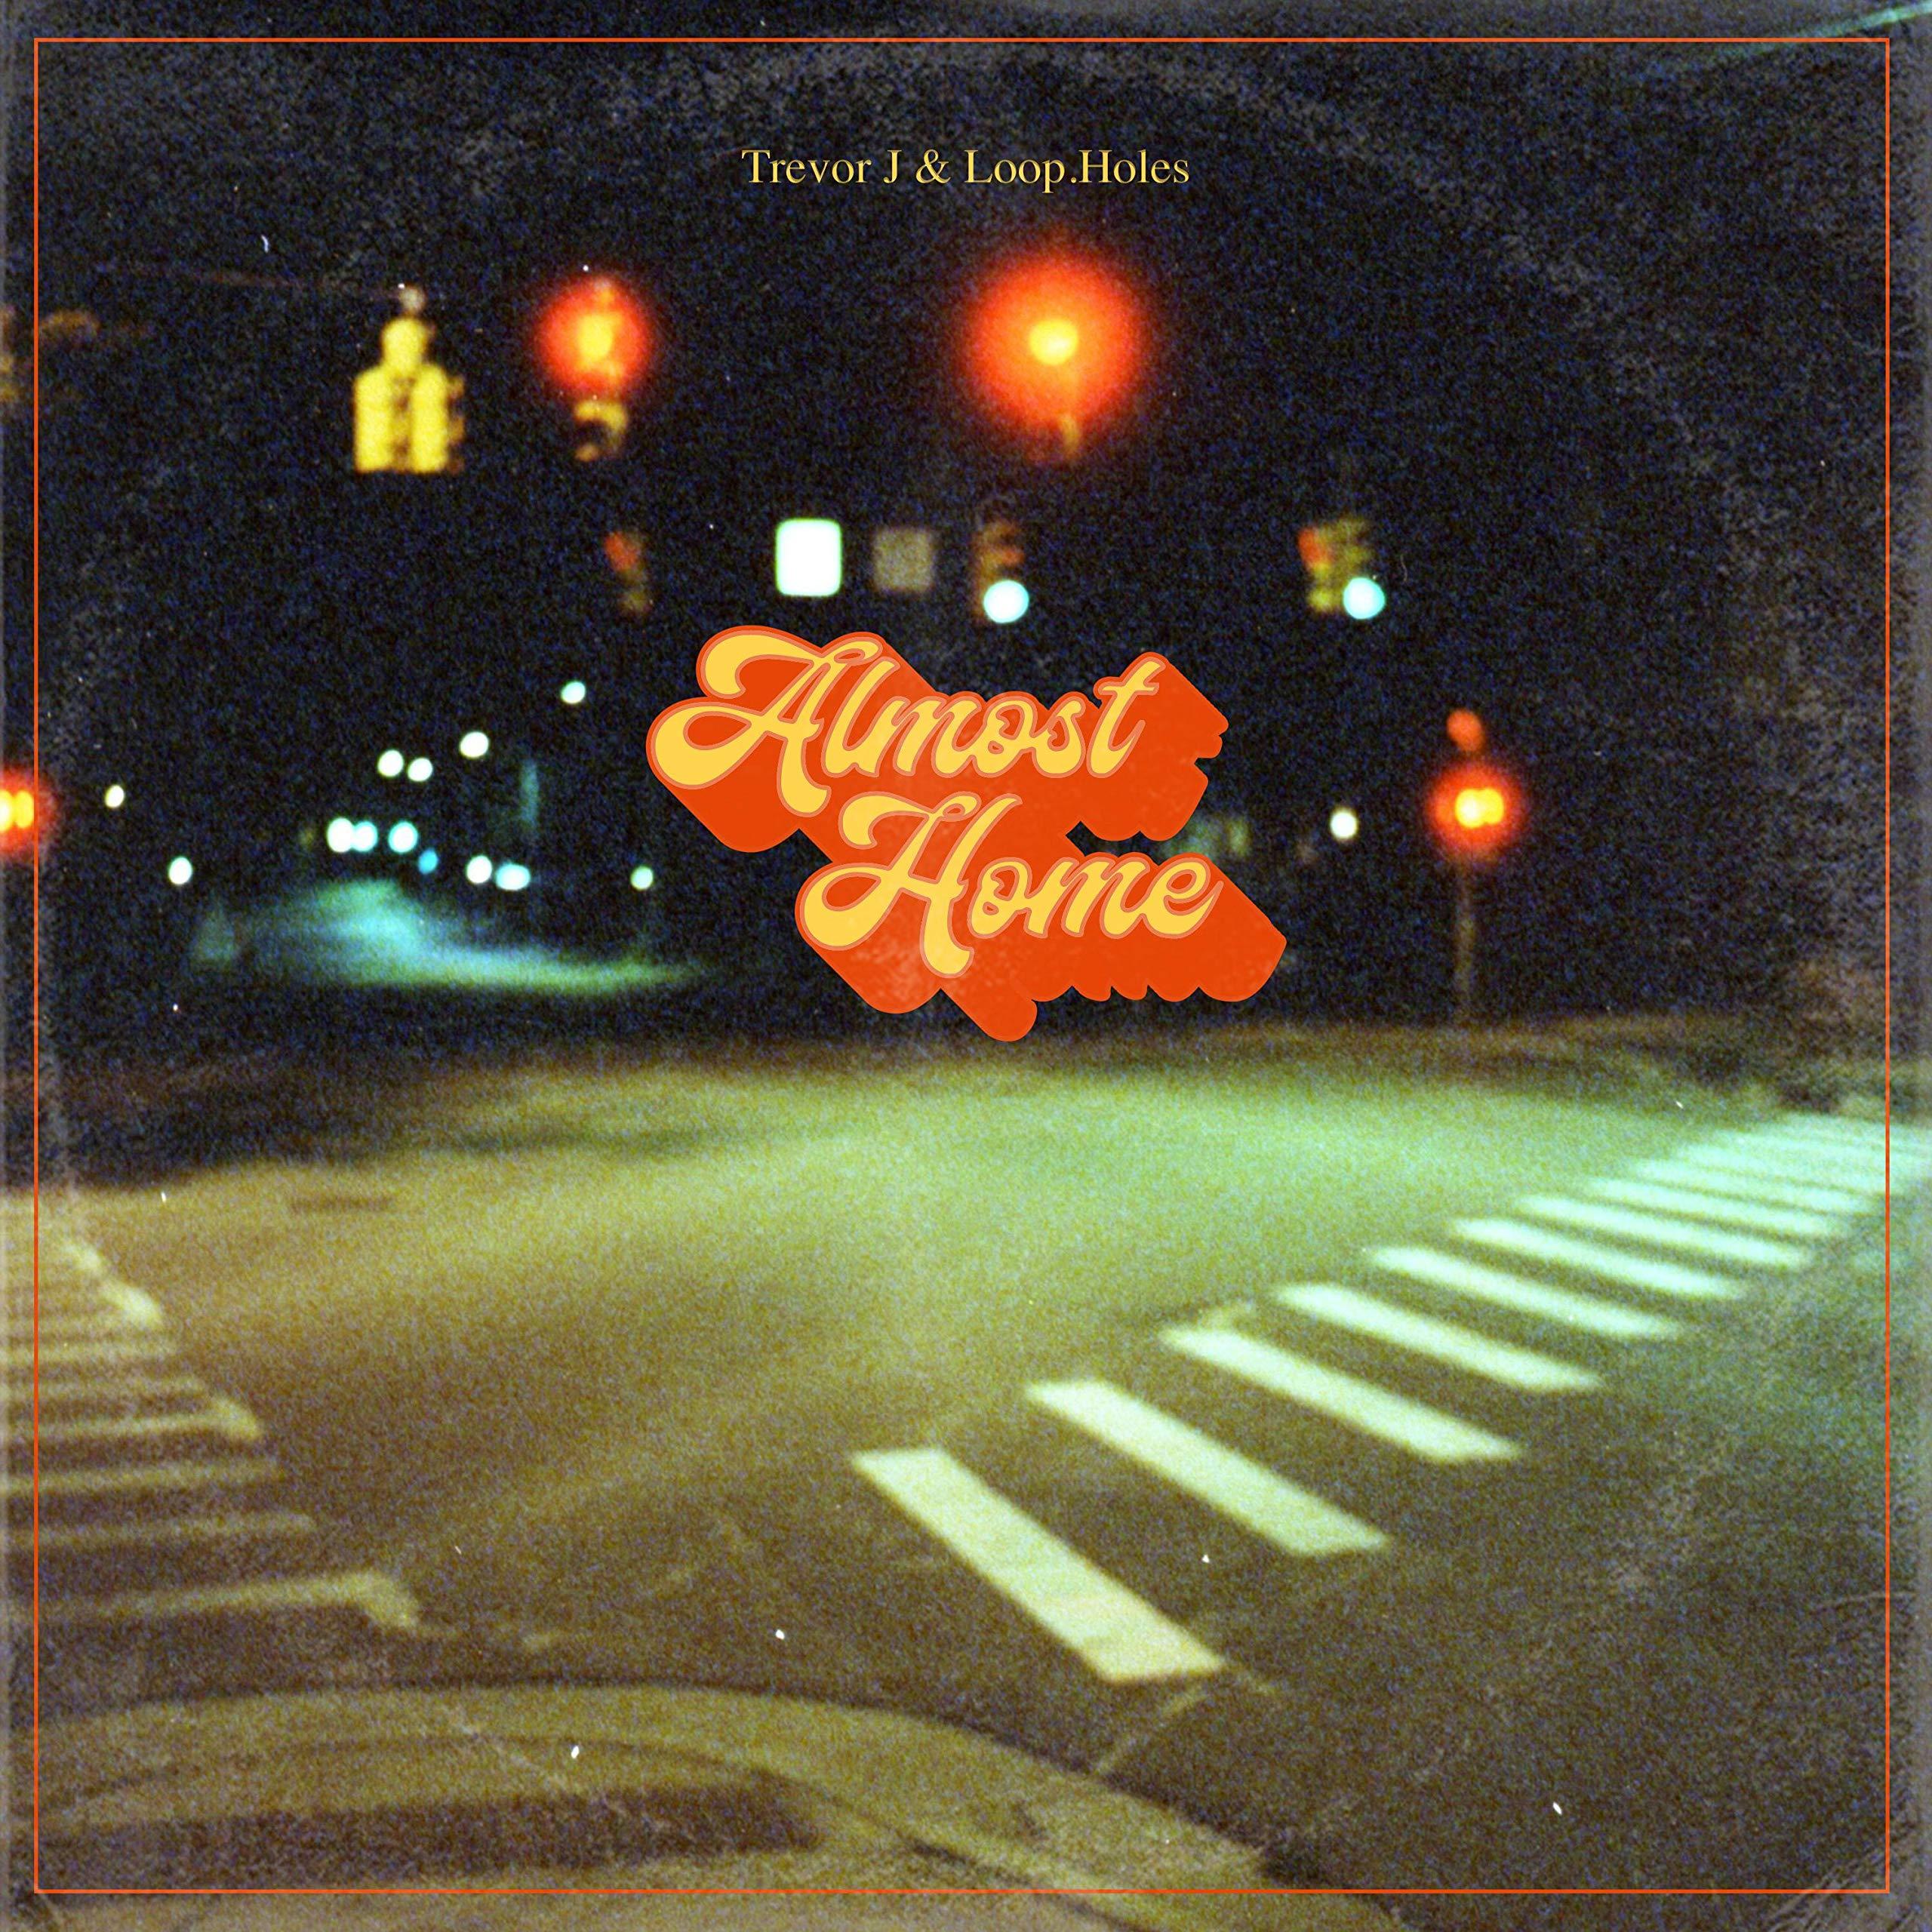 Trevor J & Loop.Holes - Almost Home (2021) [FLAC] Download